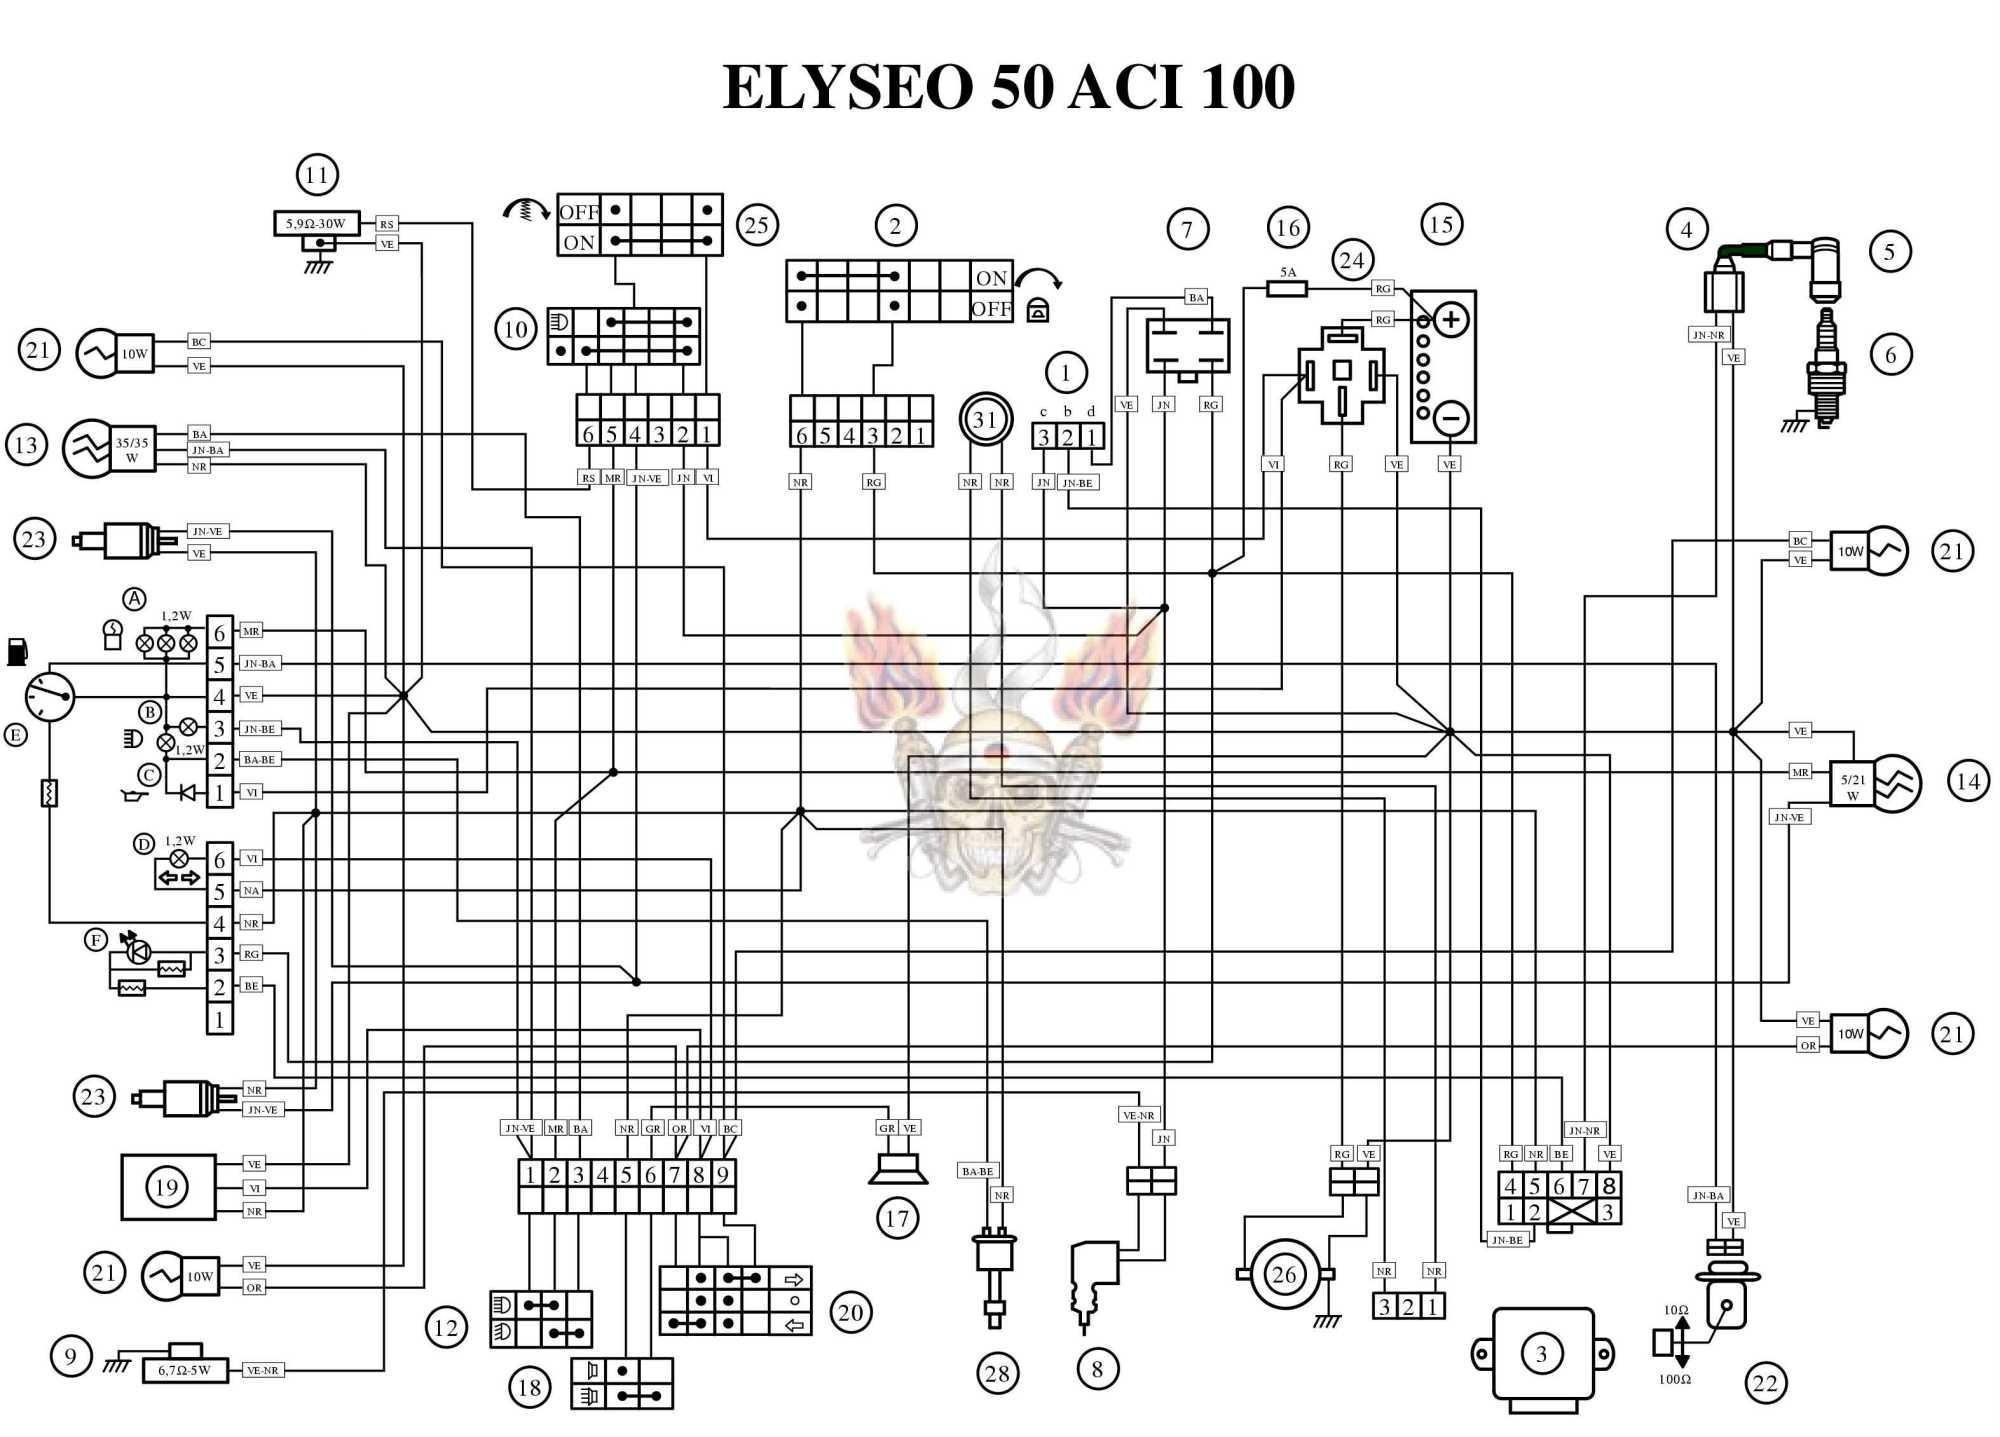 hight resolution of peugeot 307 wiring diagram efcaviation com wiring diagram peugeot elyseo 50 aci 100 peugeot 307 wiring